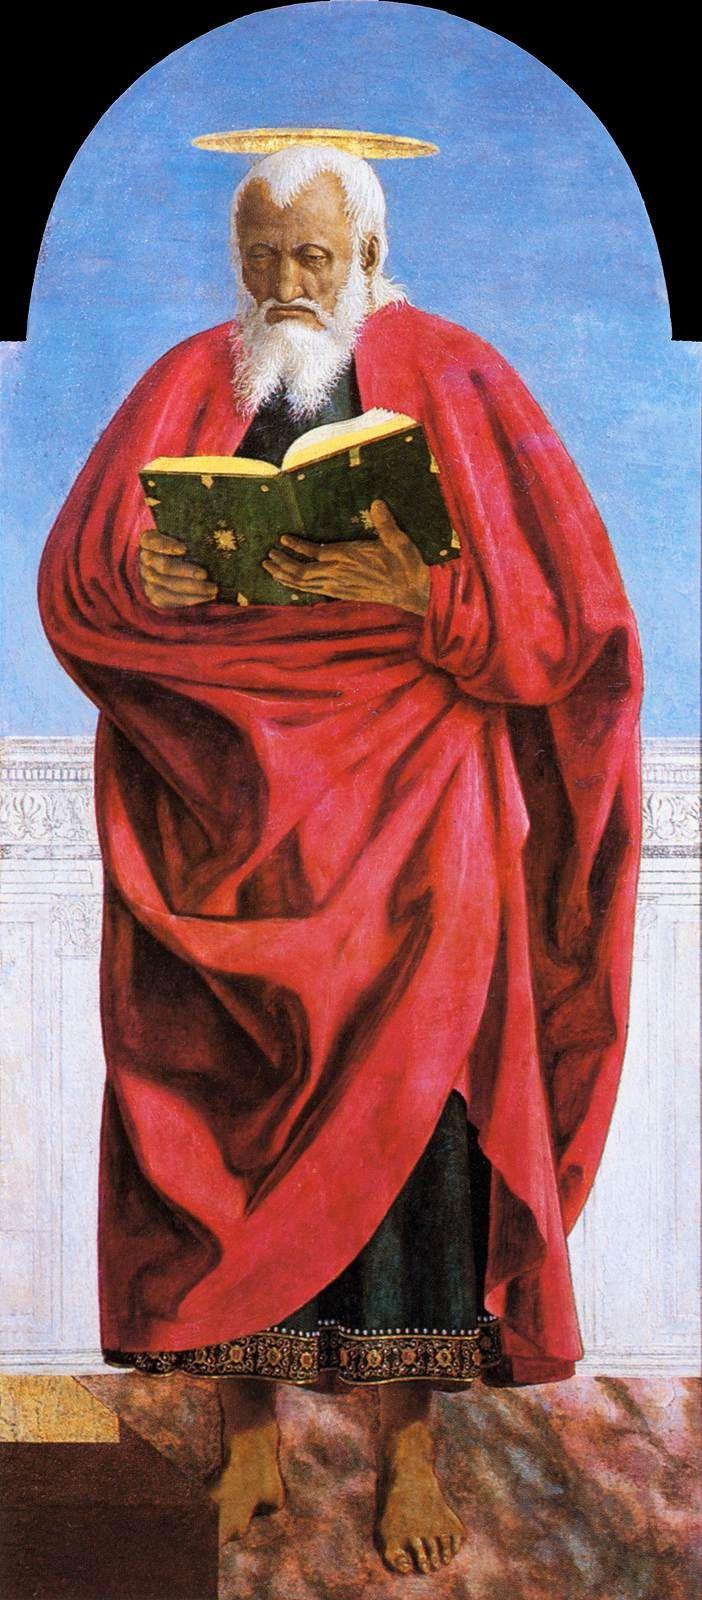 Piero della Francesca. Polyptych of St Augustine: St John the Evangelist. (c. 1460). Tempera on panel, 132 x 58 cm. Frick Collection, New York